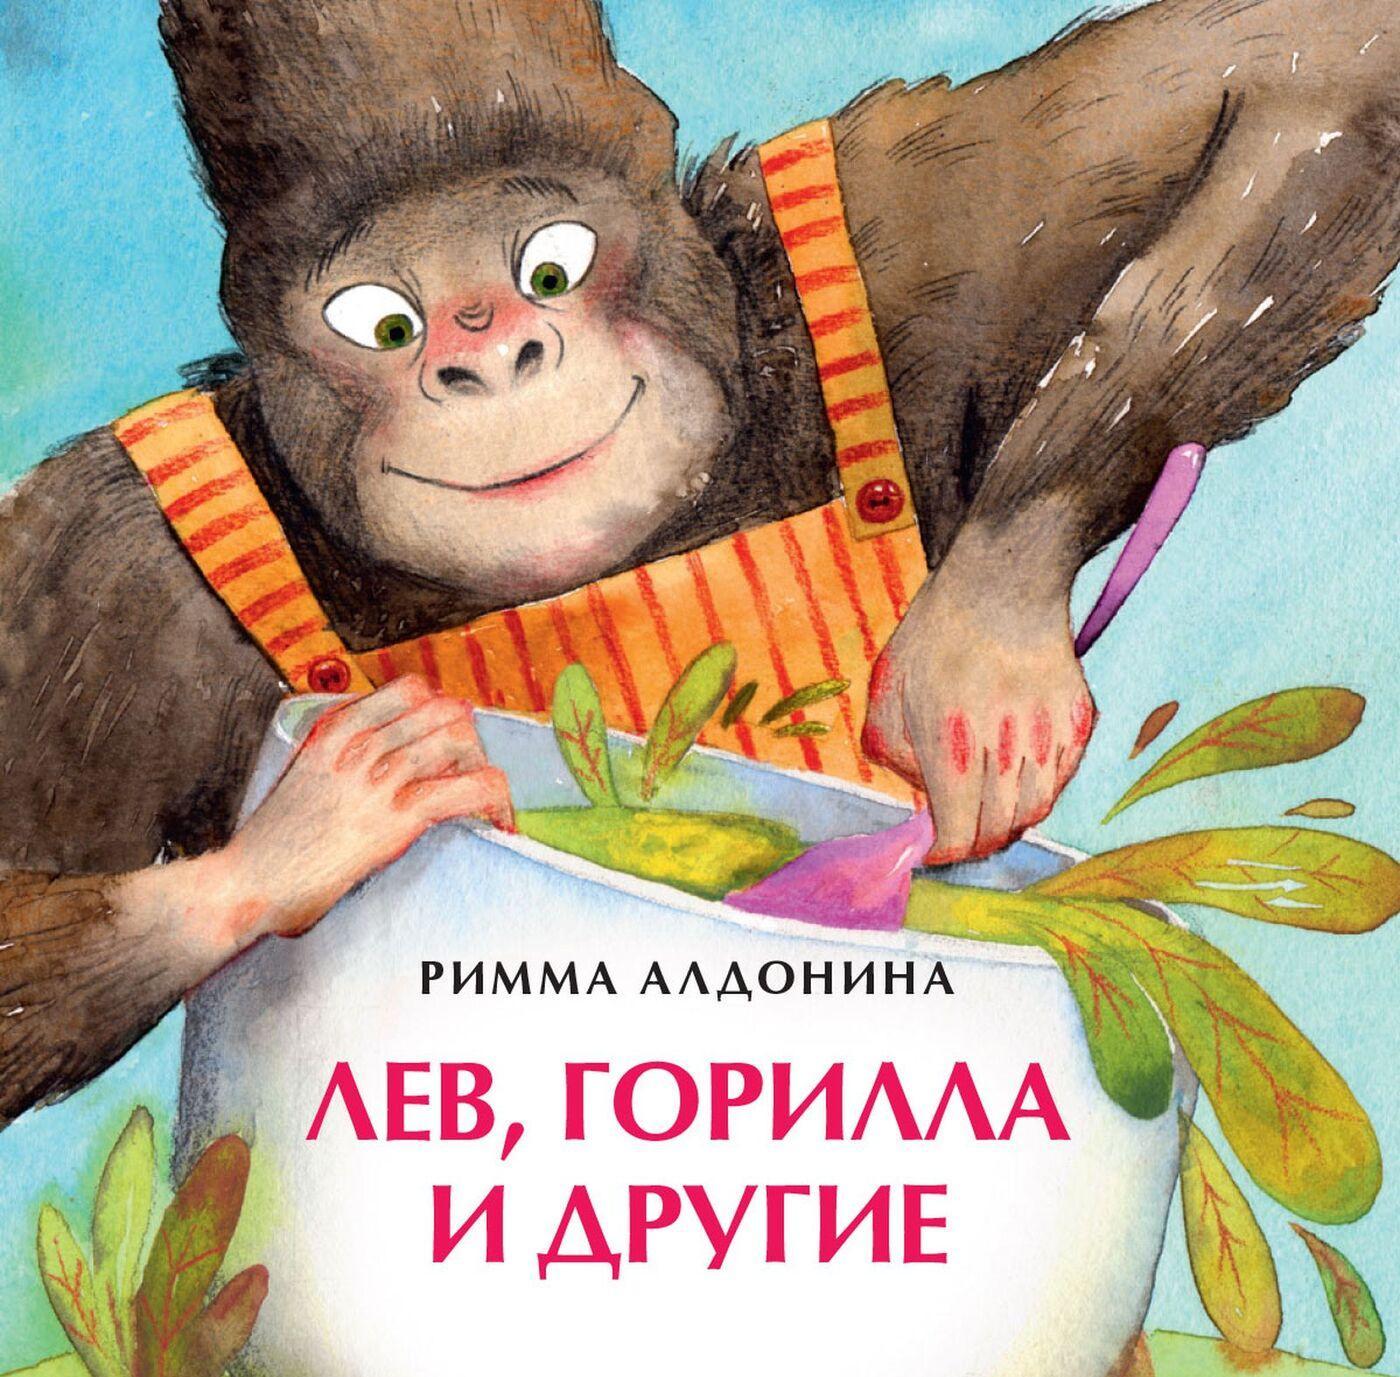 Lev, gorilla i drugie